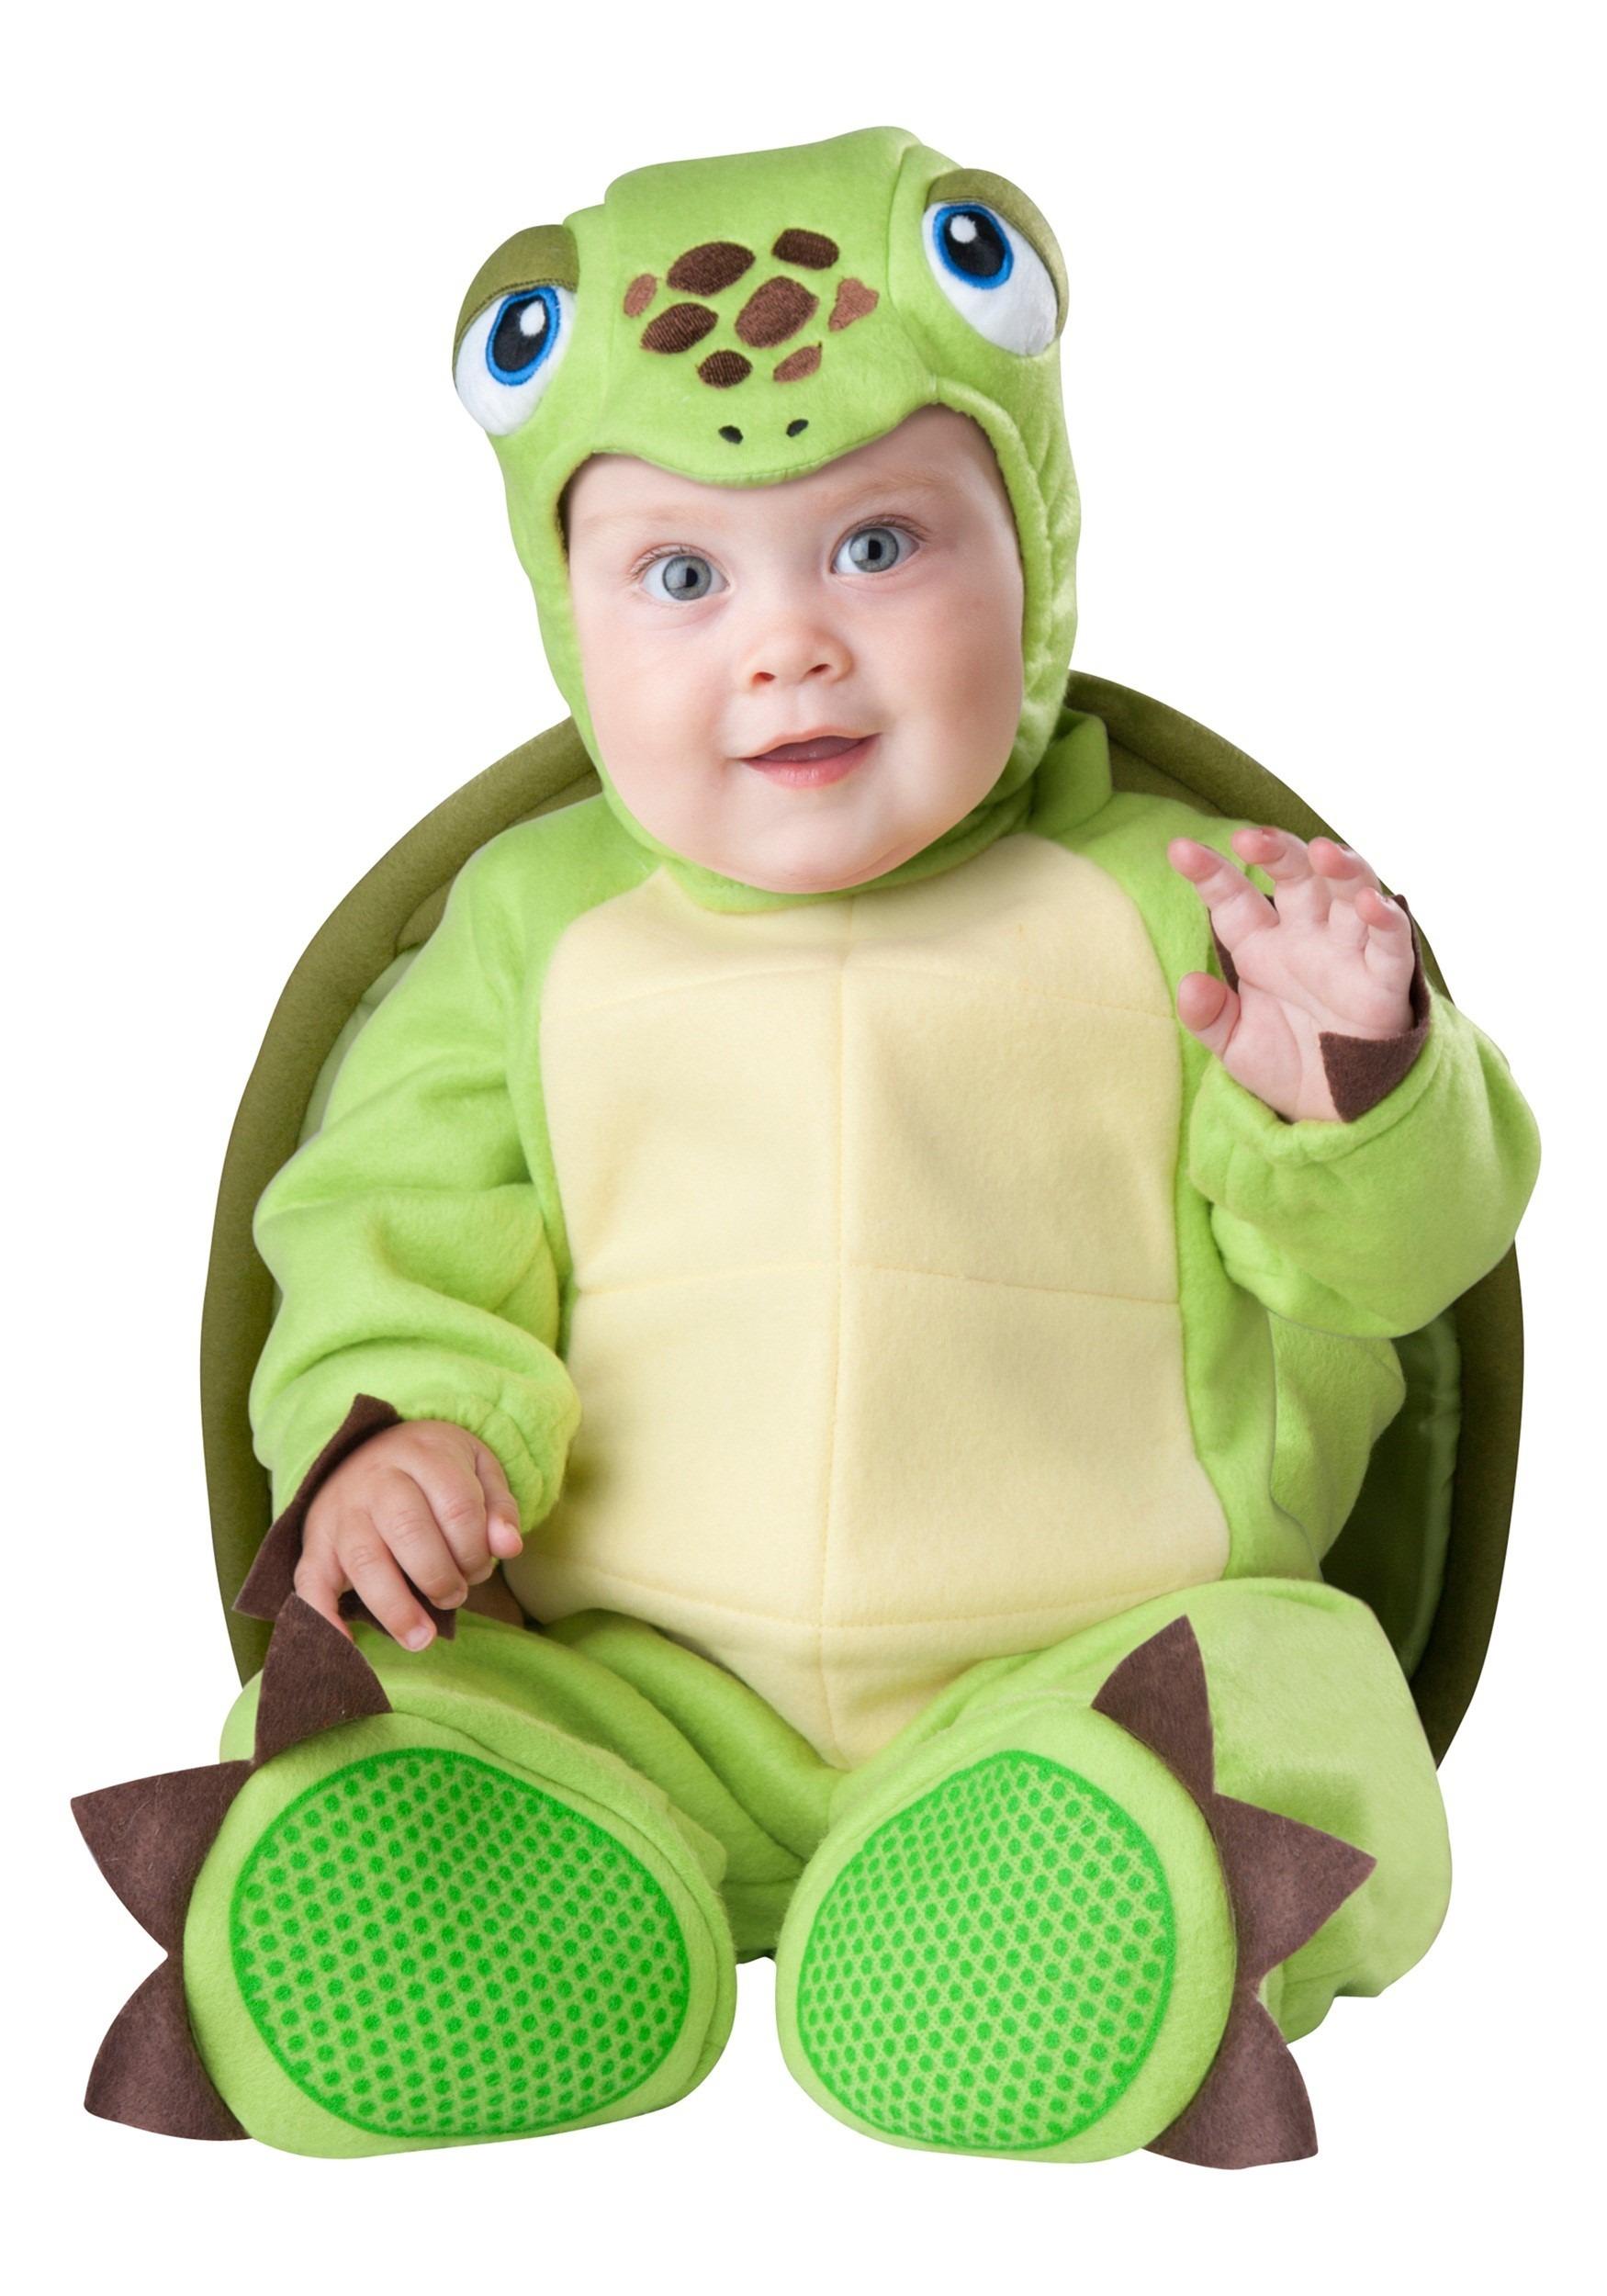 Stunning Baby Boy Ninja Turtle Costume Ideas  sc 1 st  Baby Bryone & Stunning Minnie Mouse Infant Costume Ideas - Baby Bryone